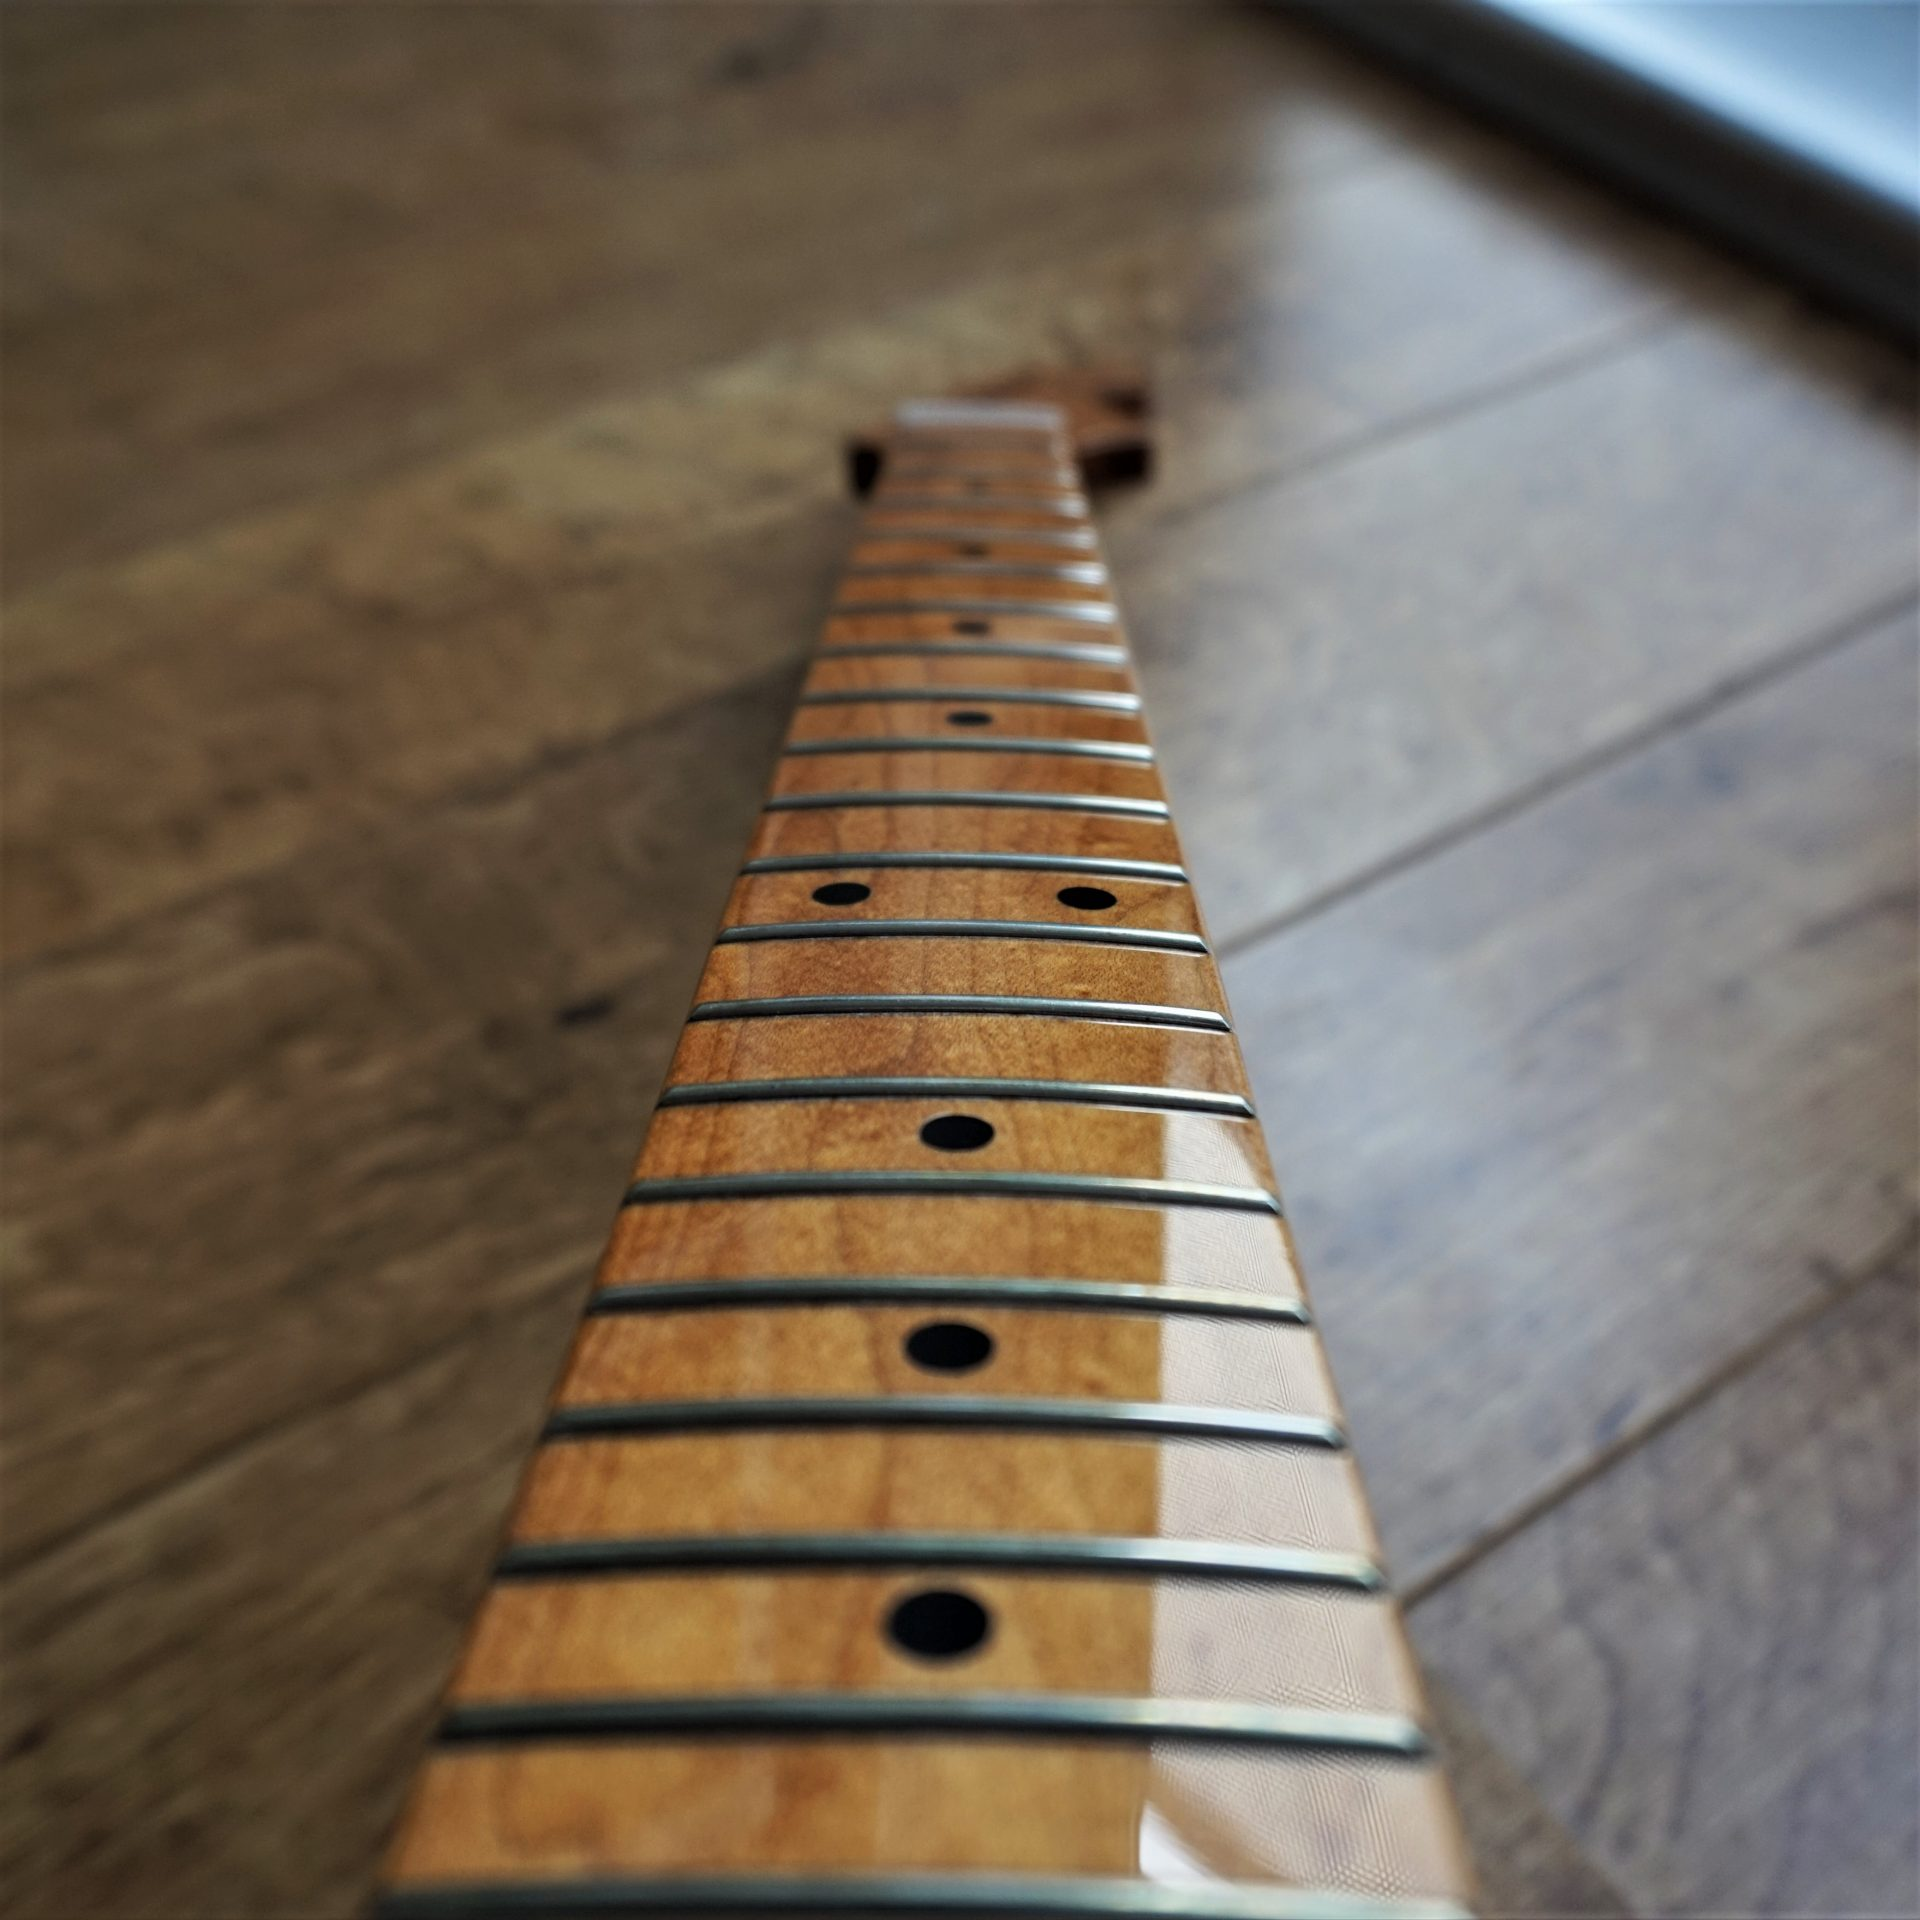 Roasted Maple Stratocaster Guitar Neck Gloss